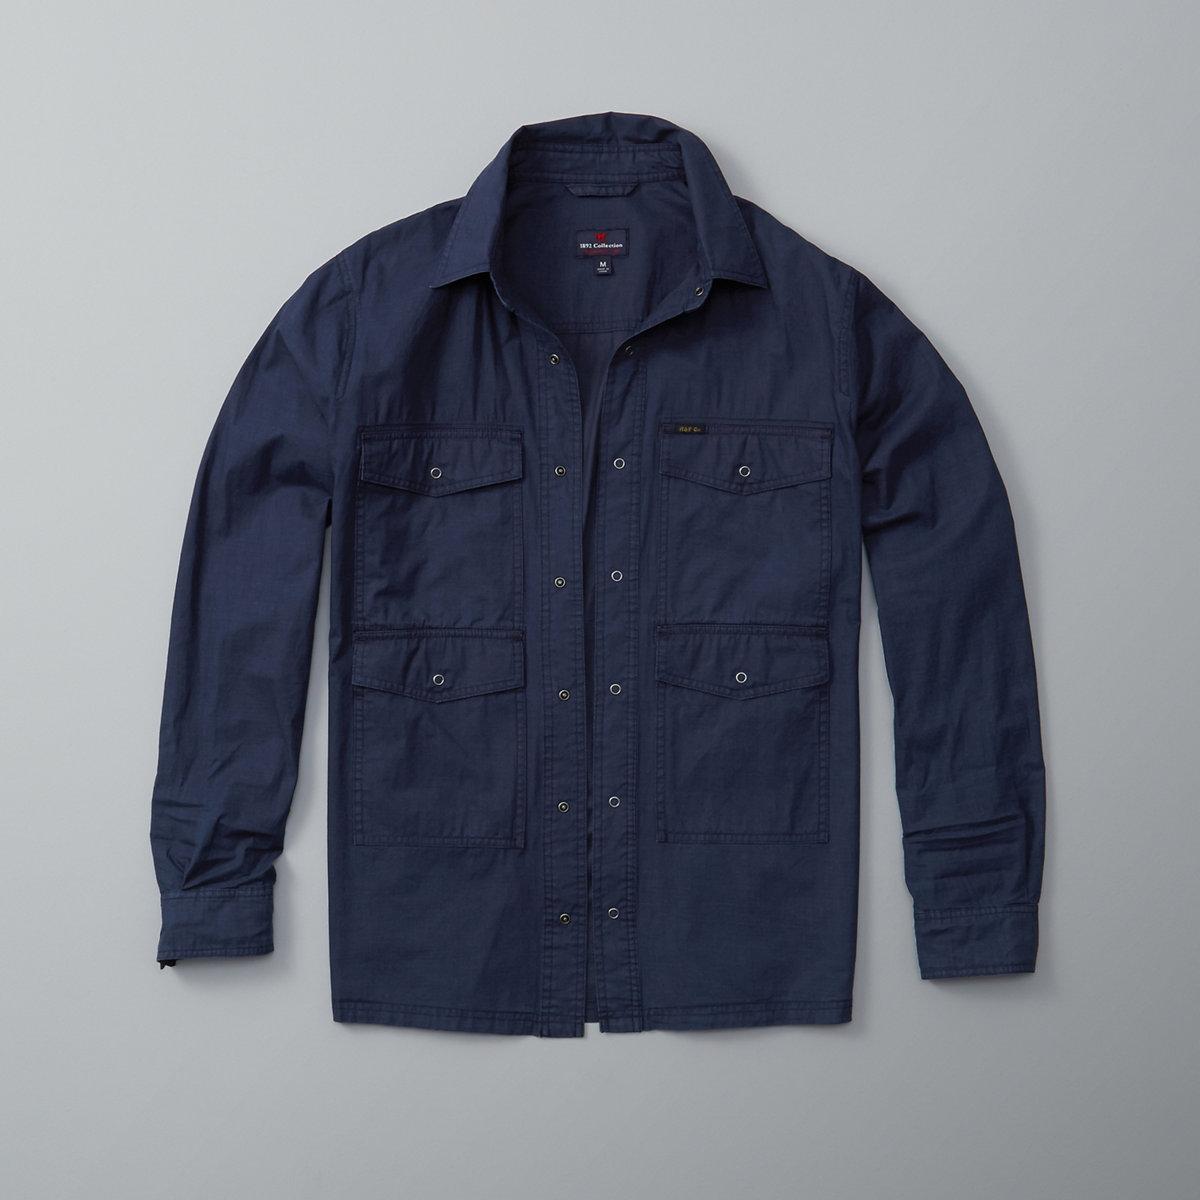 1892 Fishing Shirt Jacket